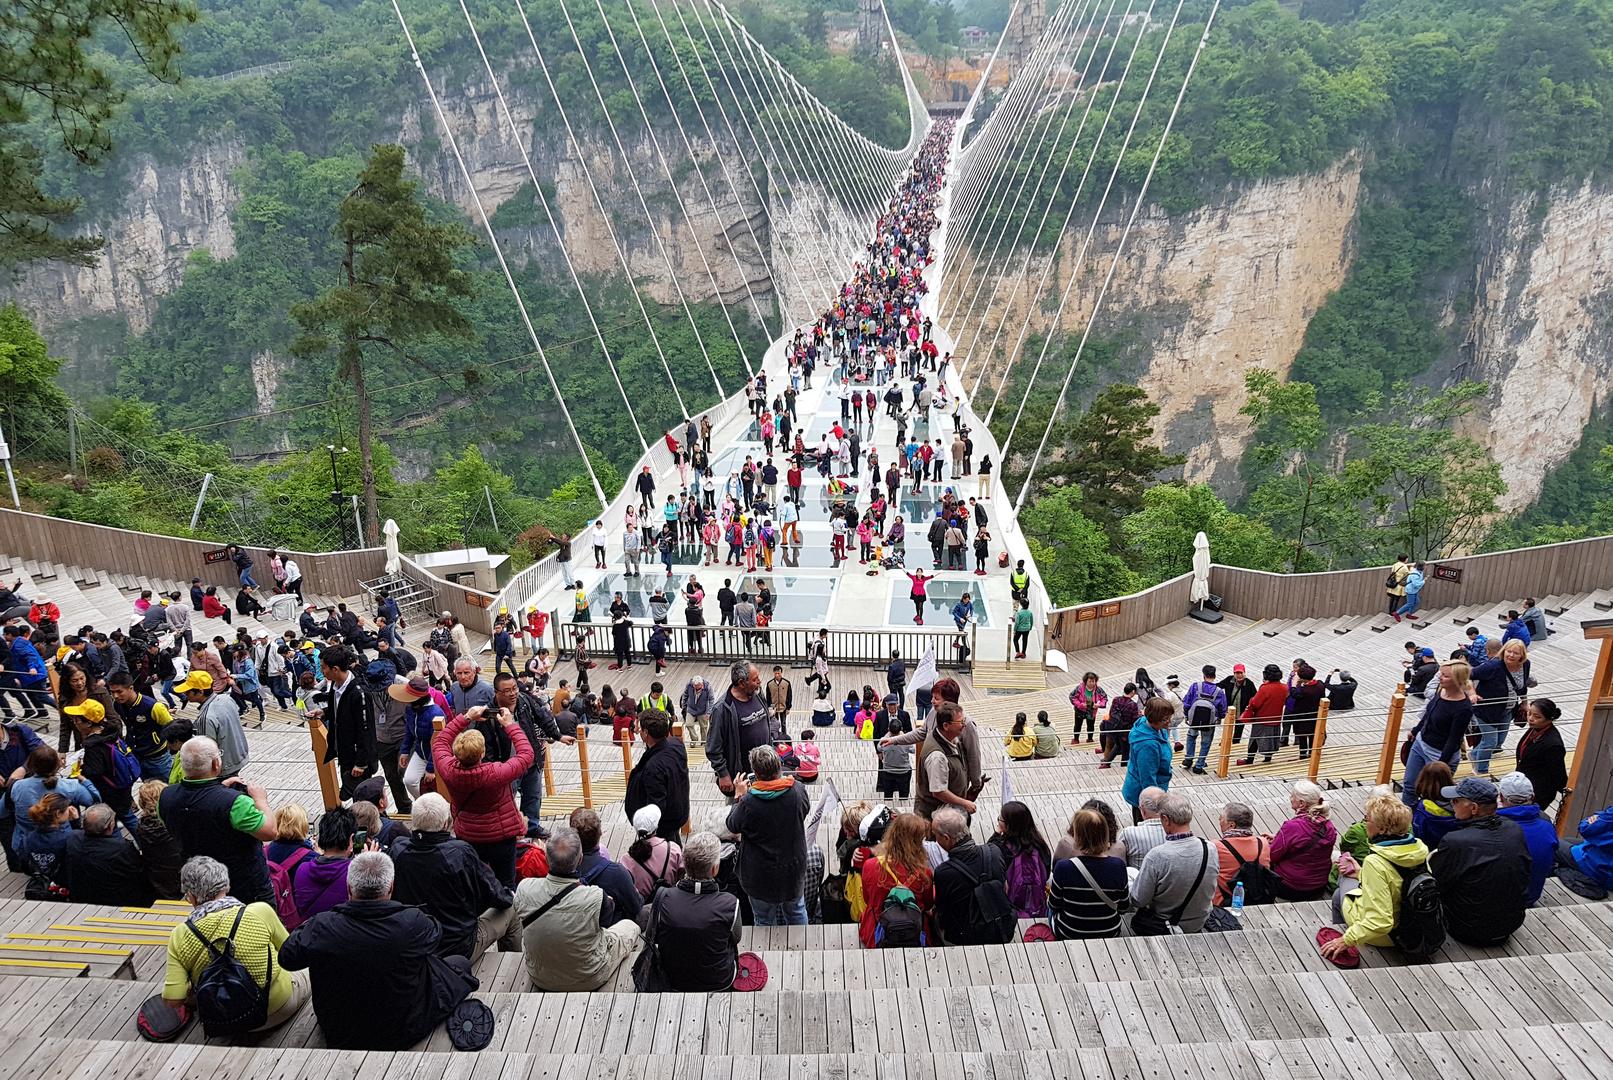 Die gläserne Hängebrücke